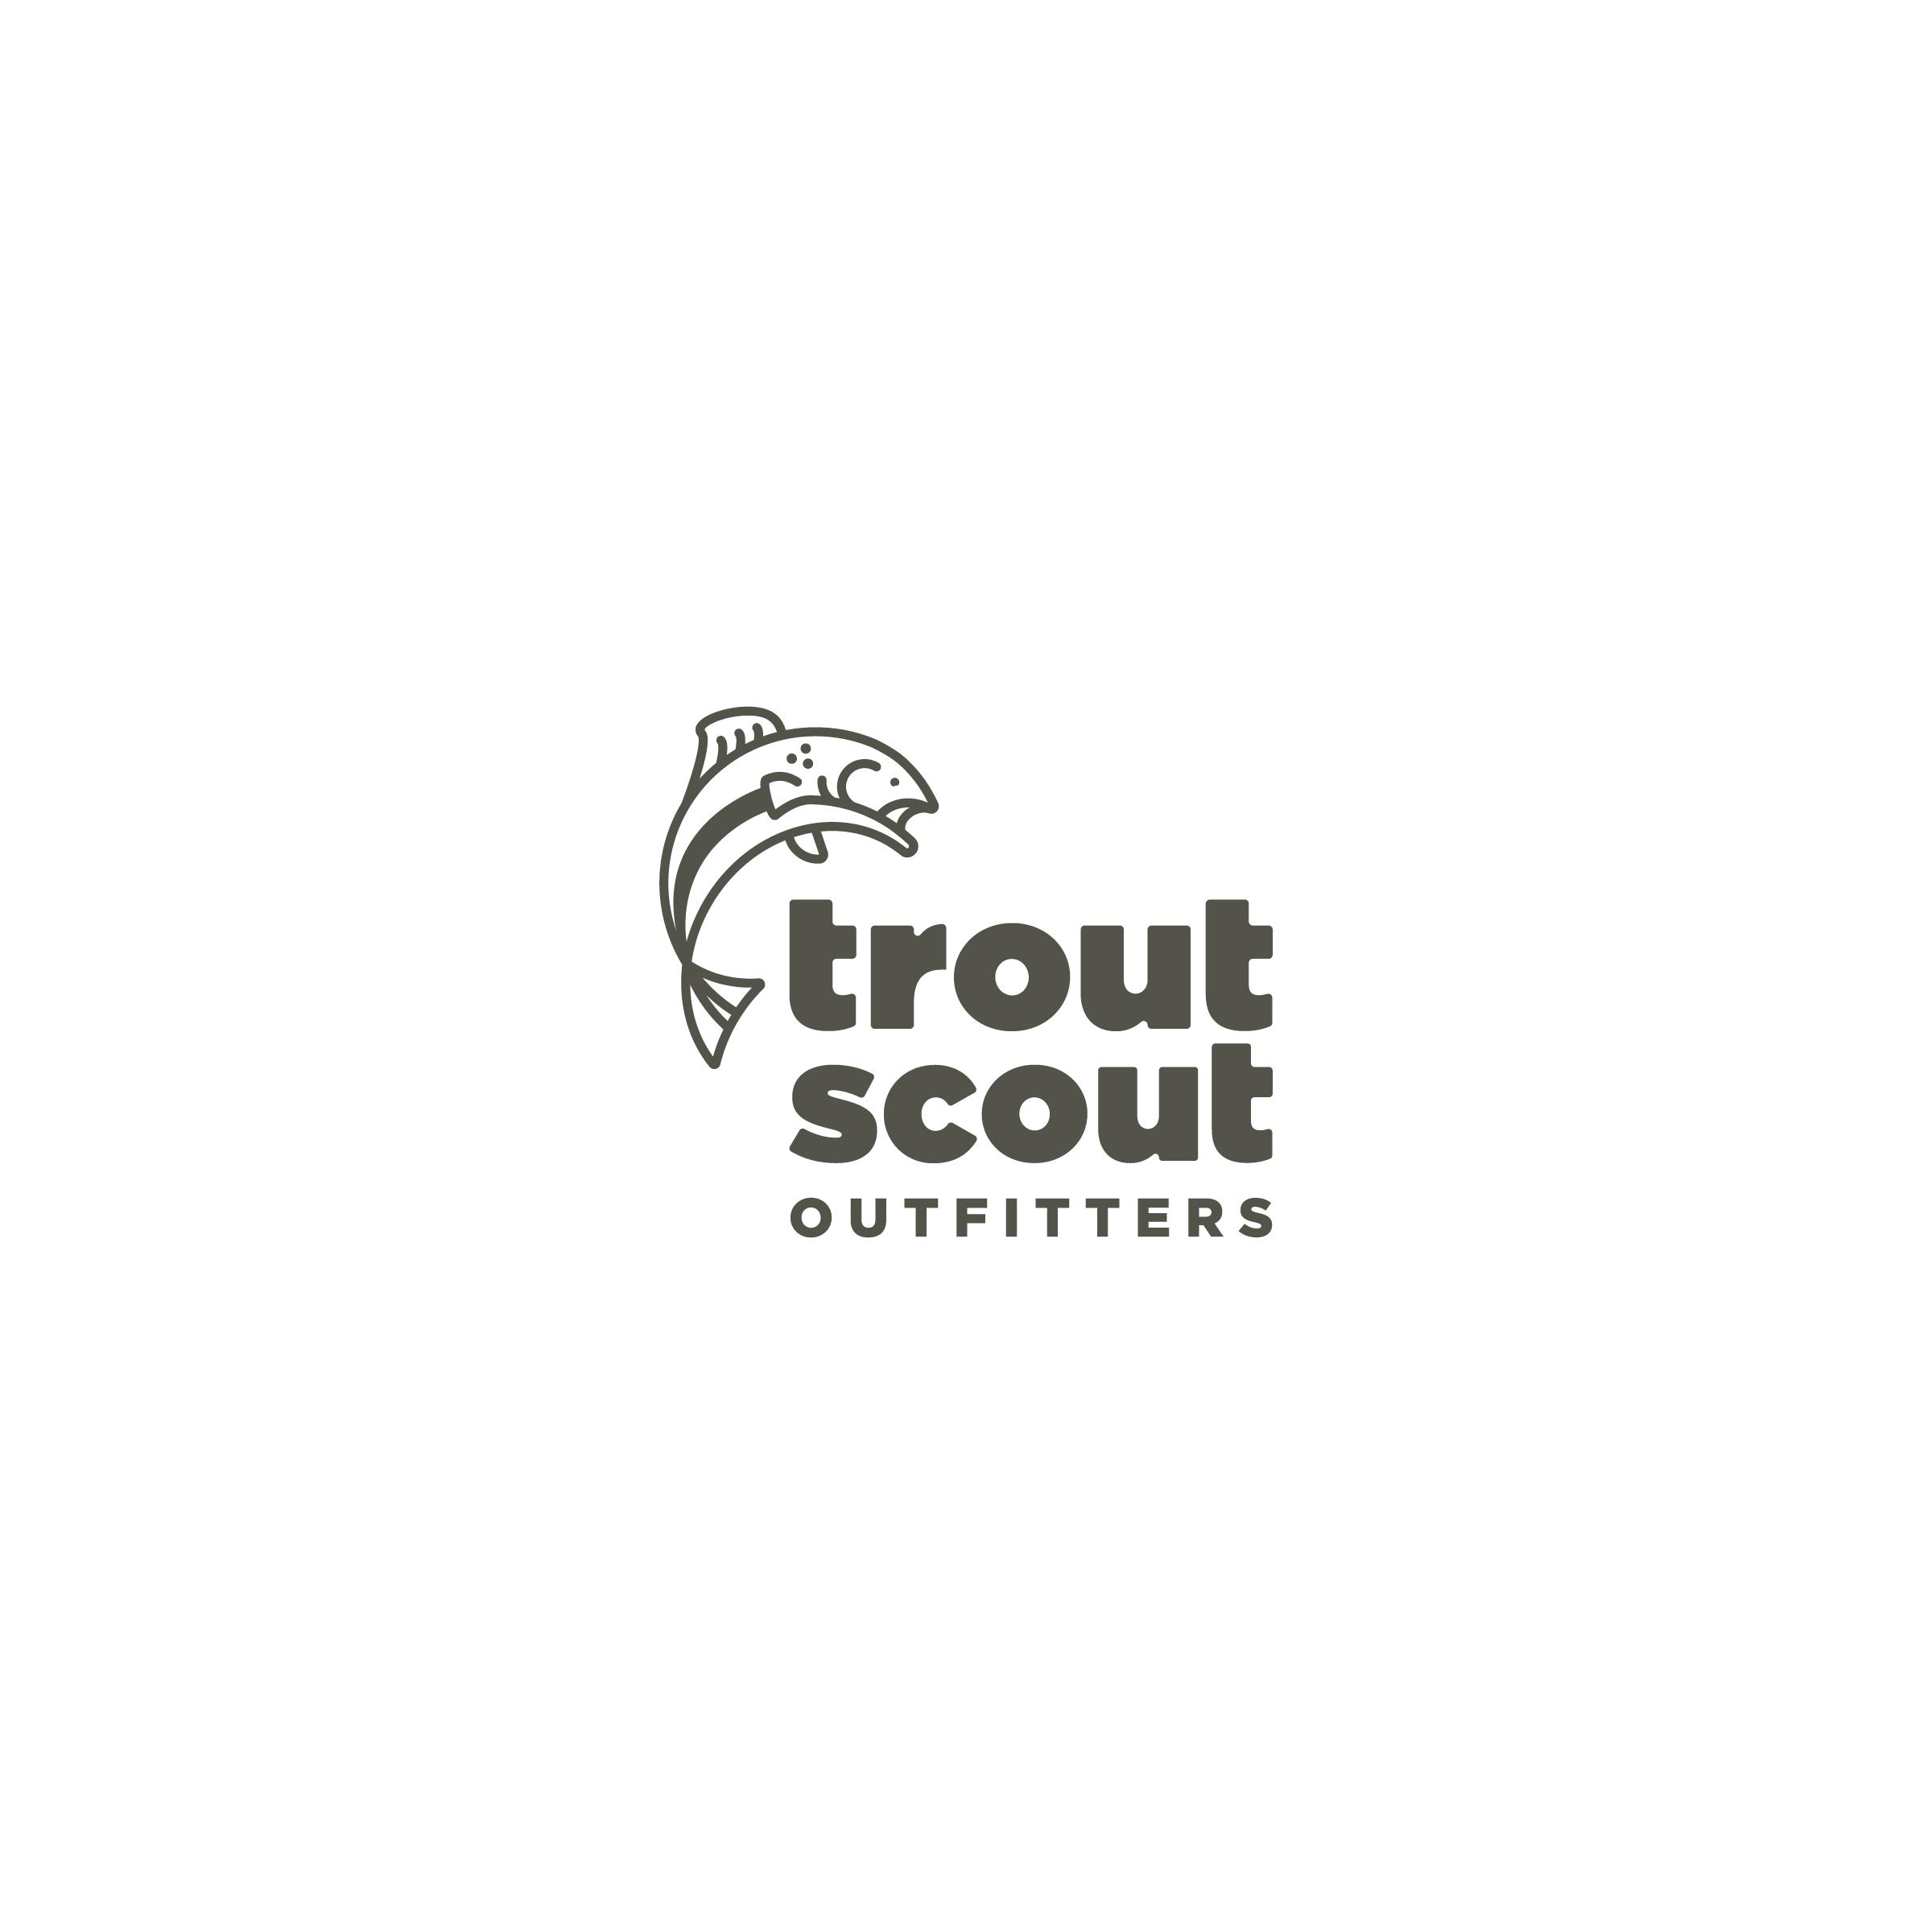 TroutScoutOutfitters_DkGrey_Vert.jpg